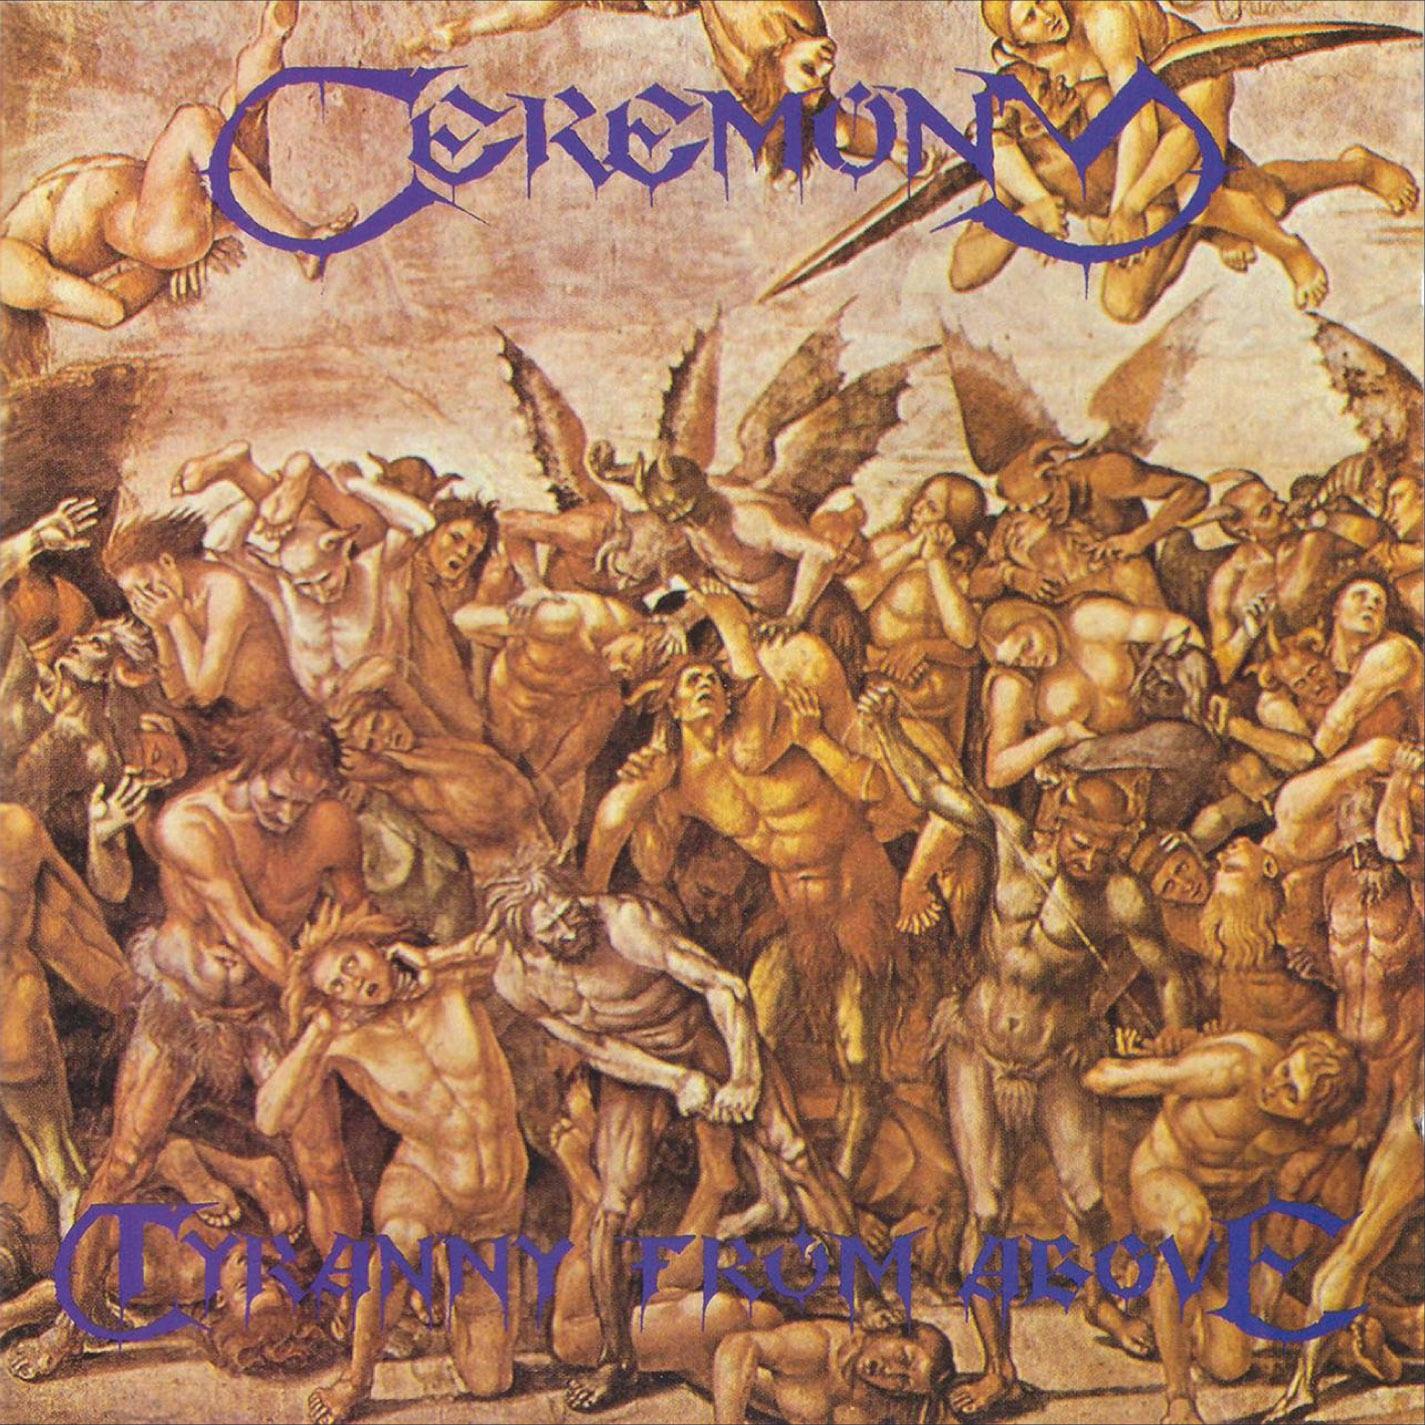 Ceremony – Tyranny From Above